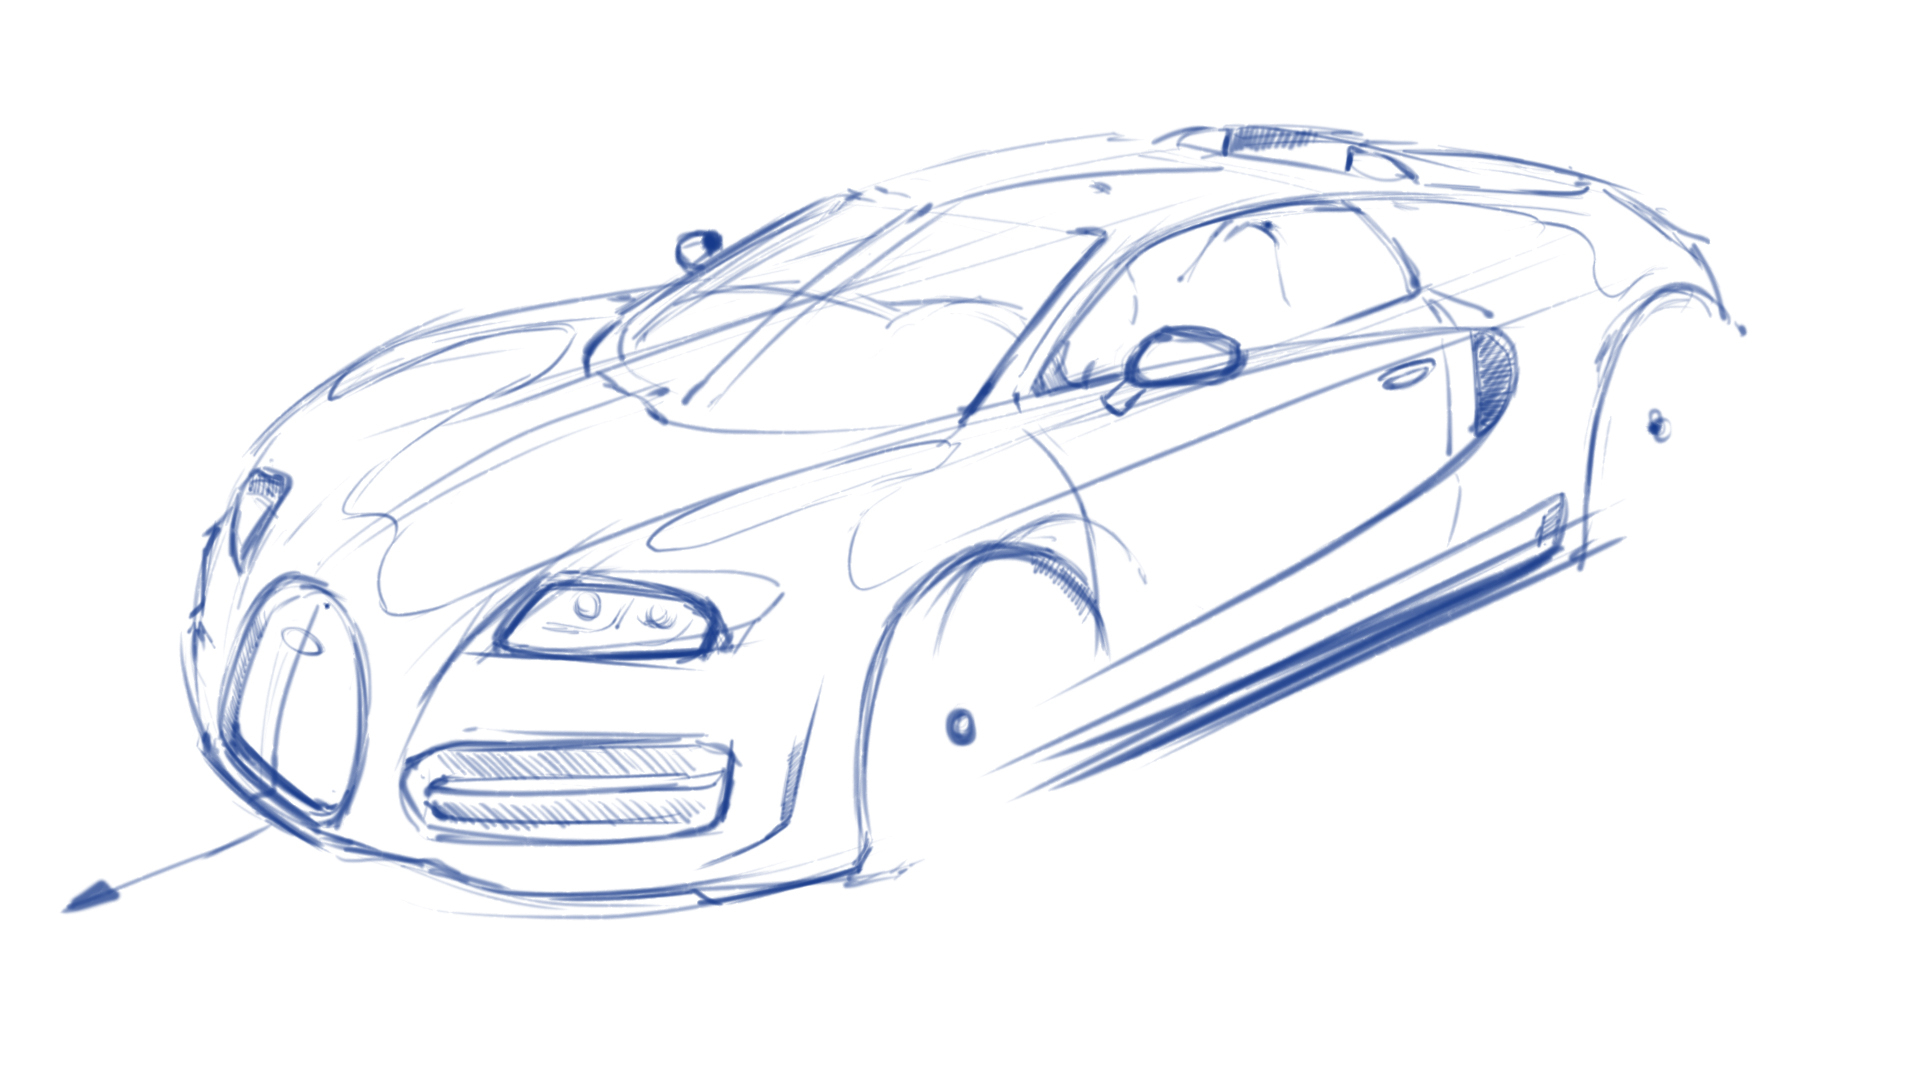 1920x1080 Cars Sketch Drawing How To Draw Ferrari 360, A Sports Car, Easy